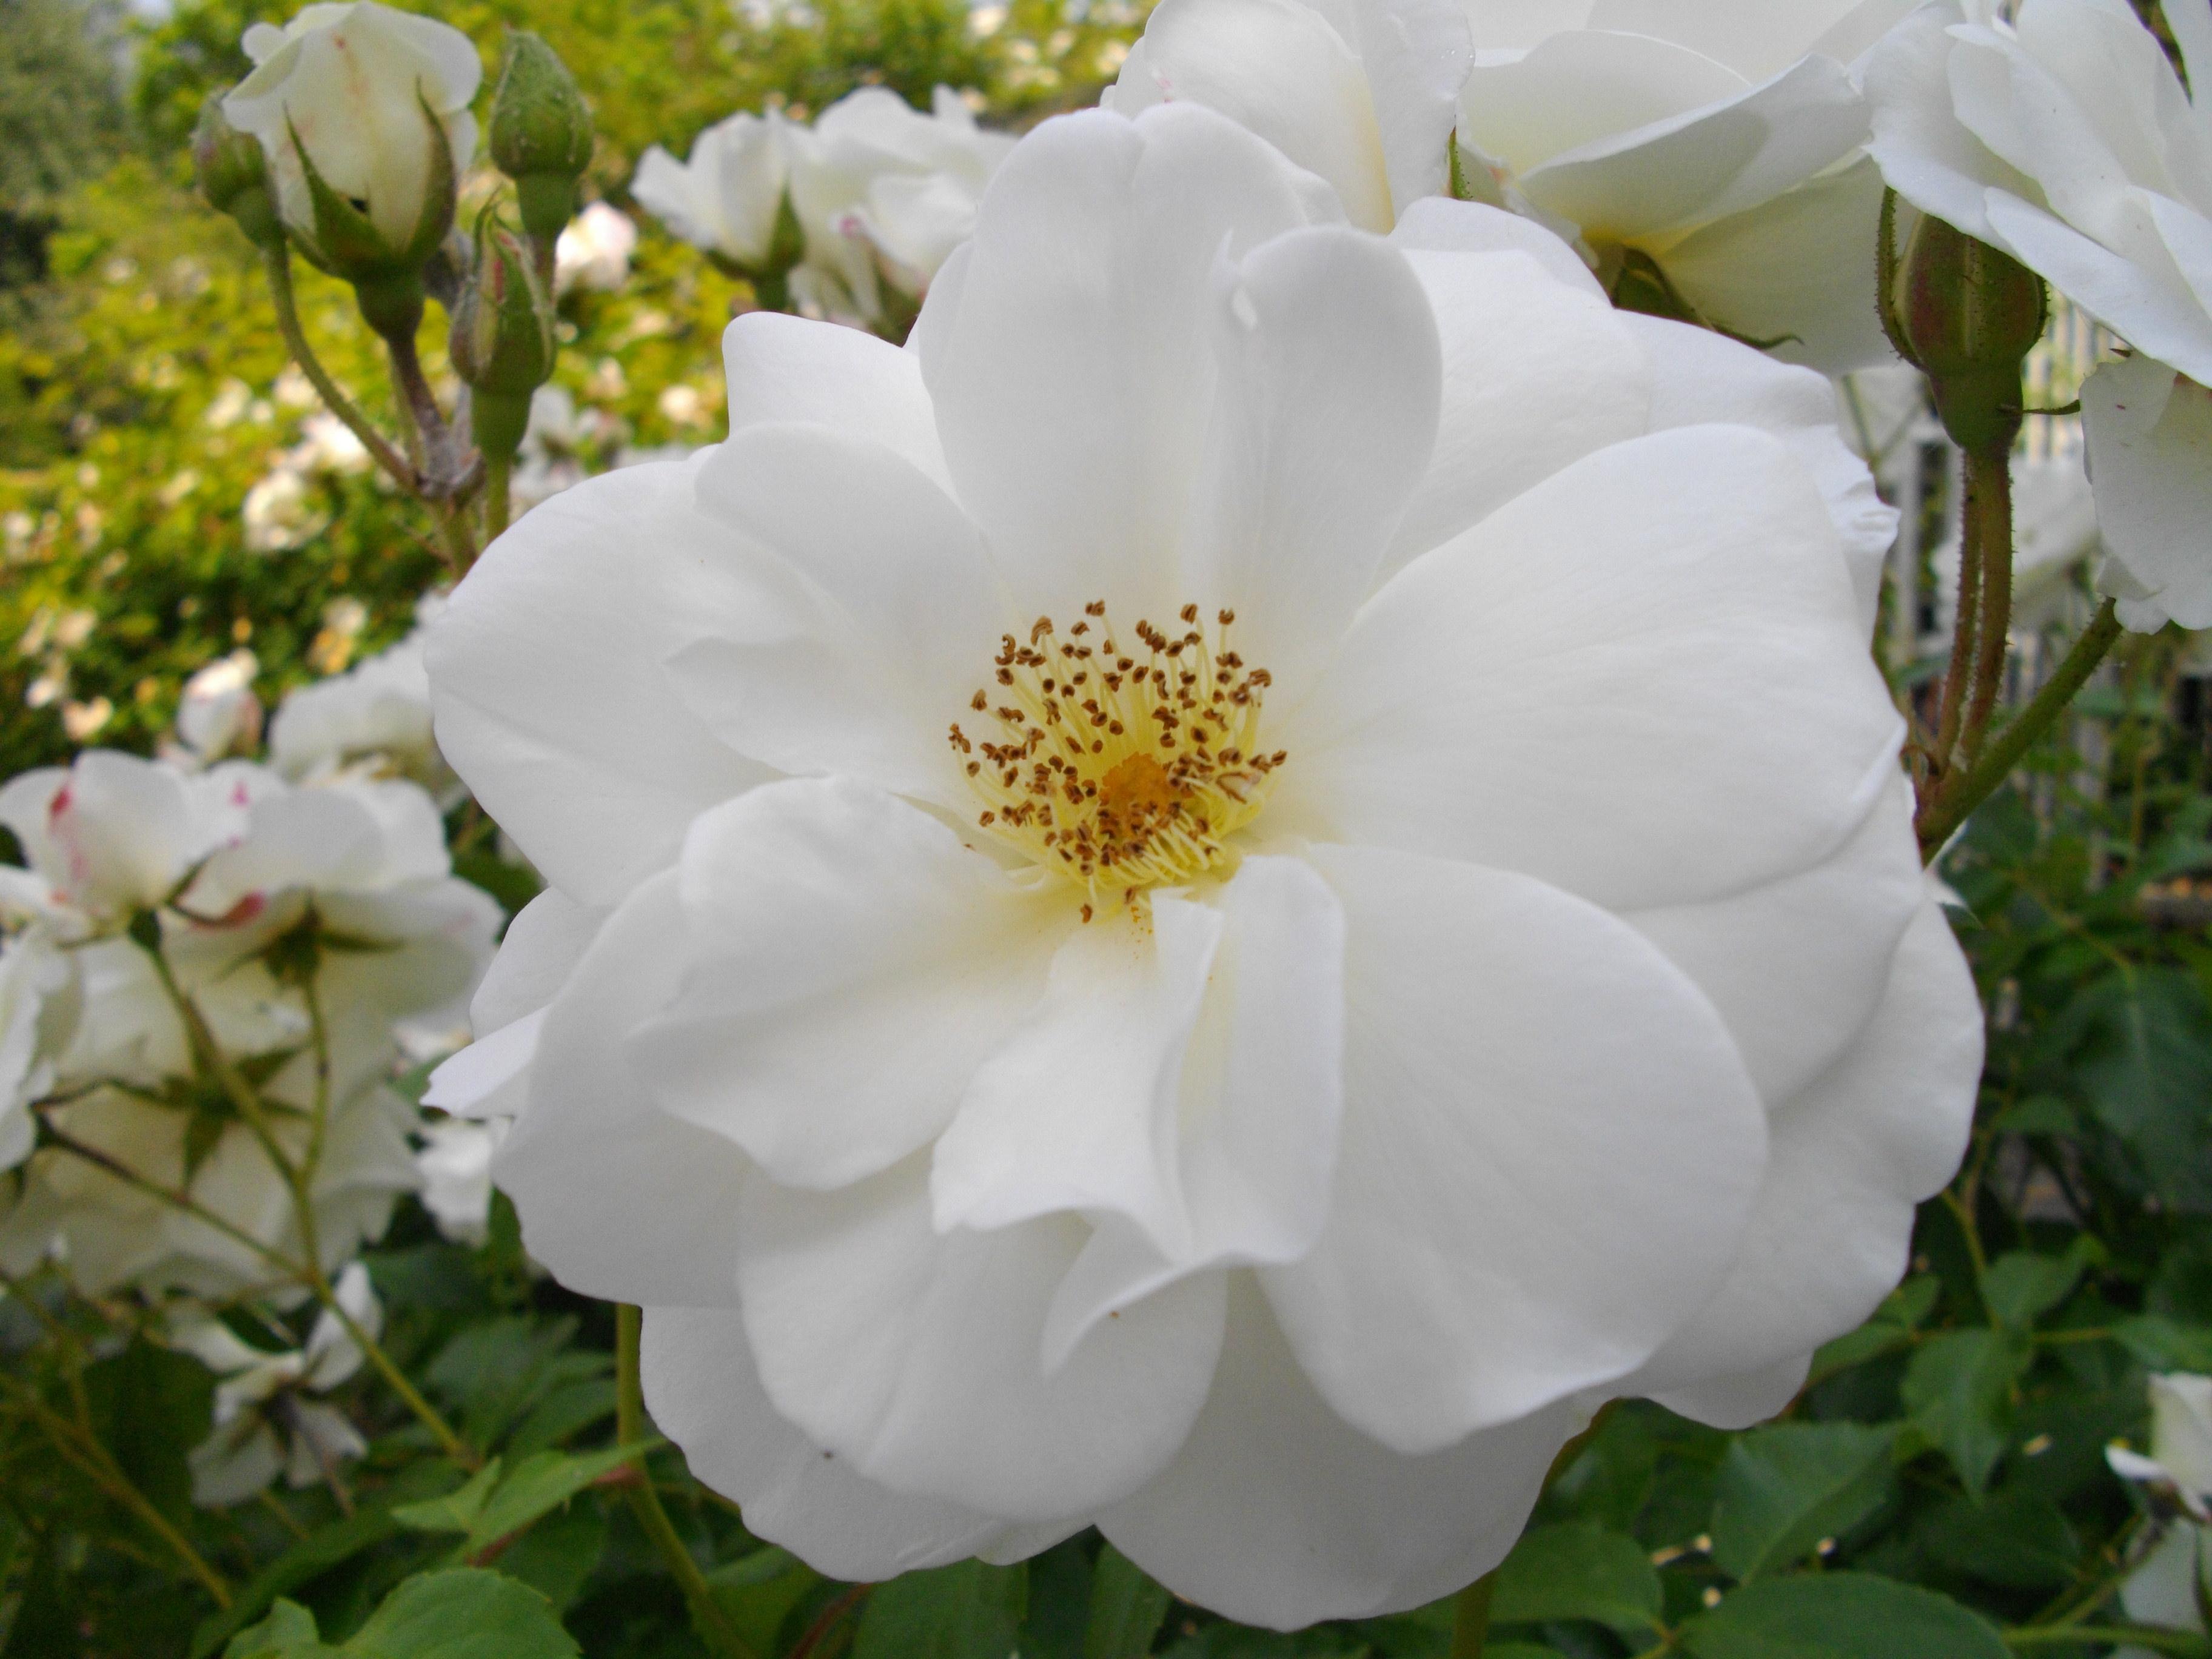 Http Commons Wikimedia Org Wiki File Fleur Blanche Jpg